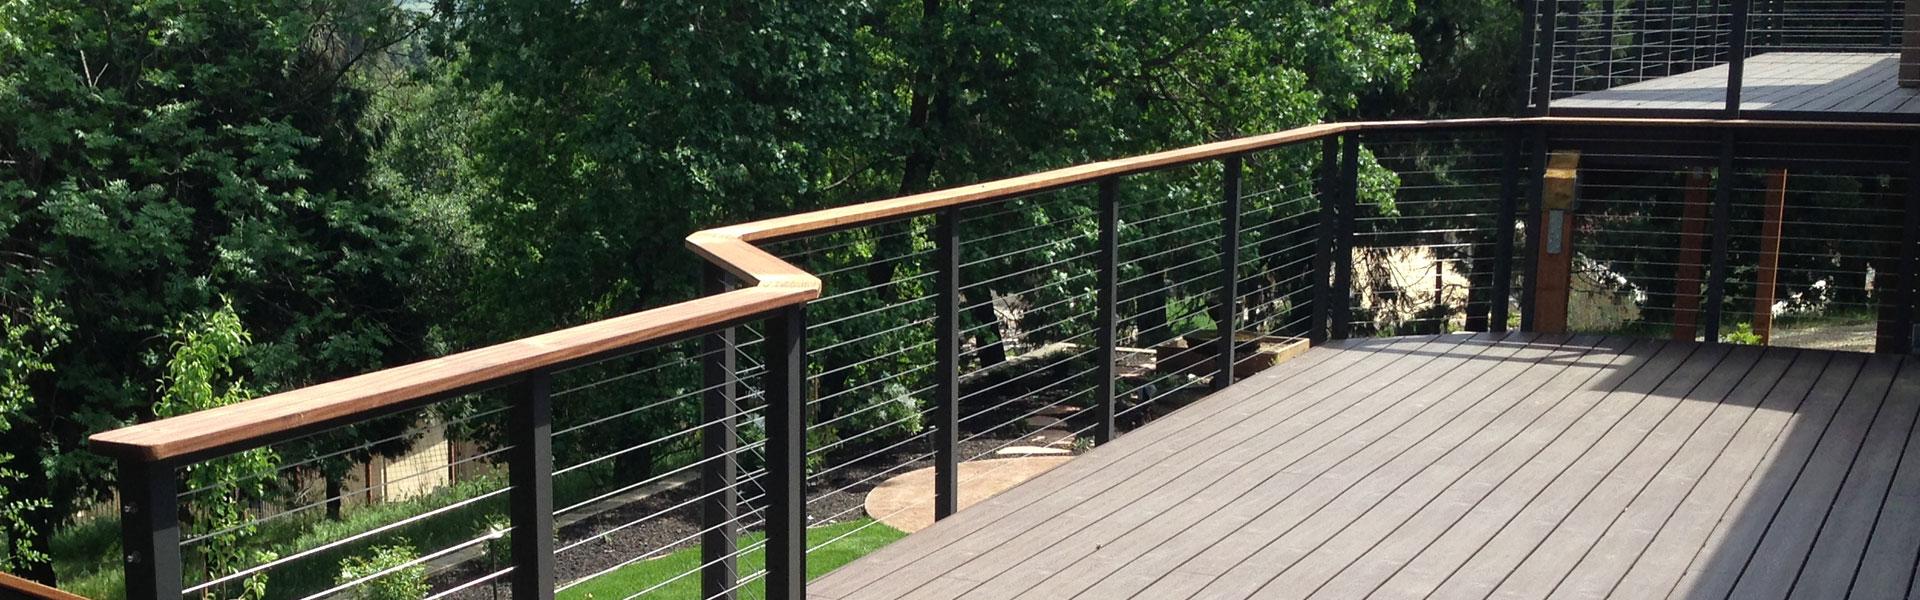 Modern Deck Rails: Glass vs Cable